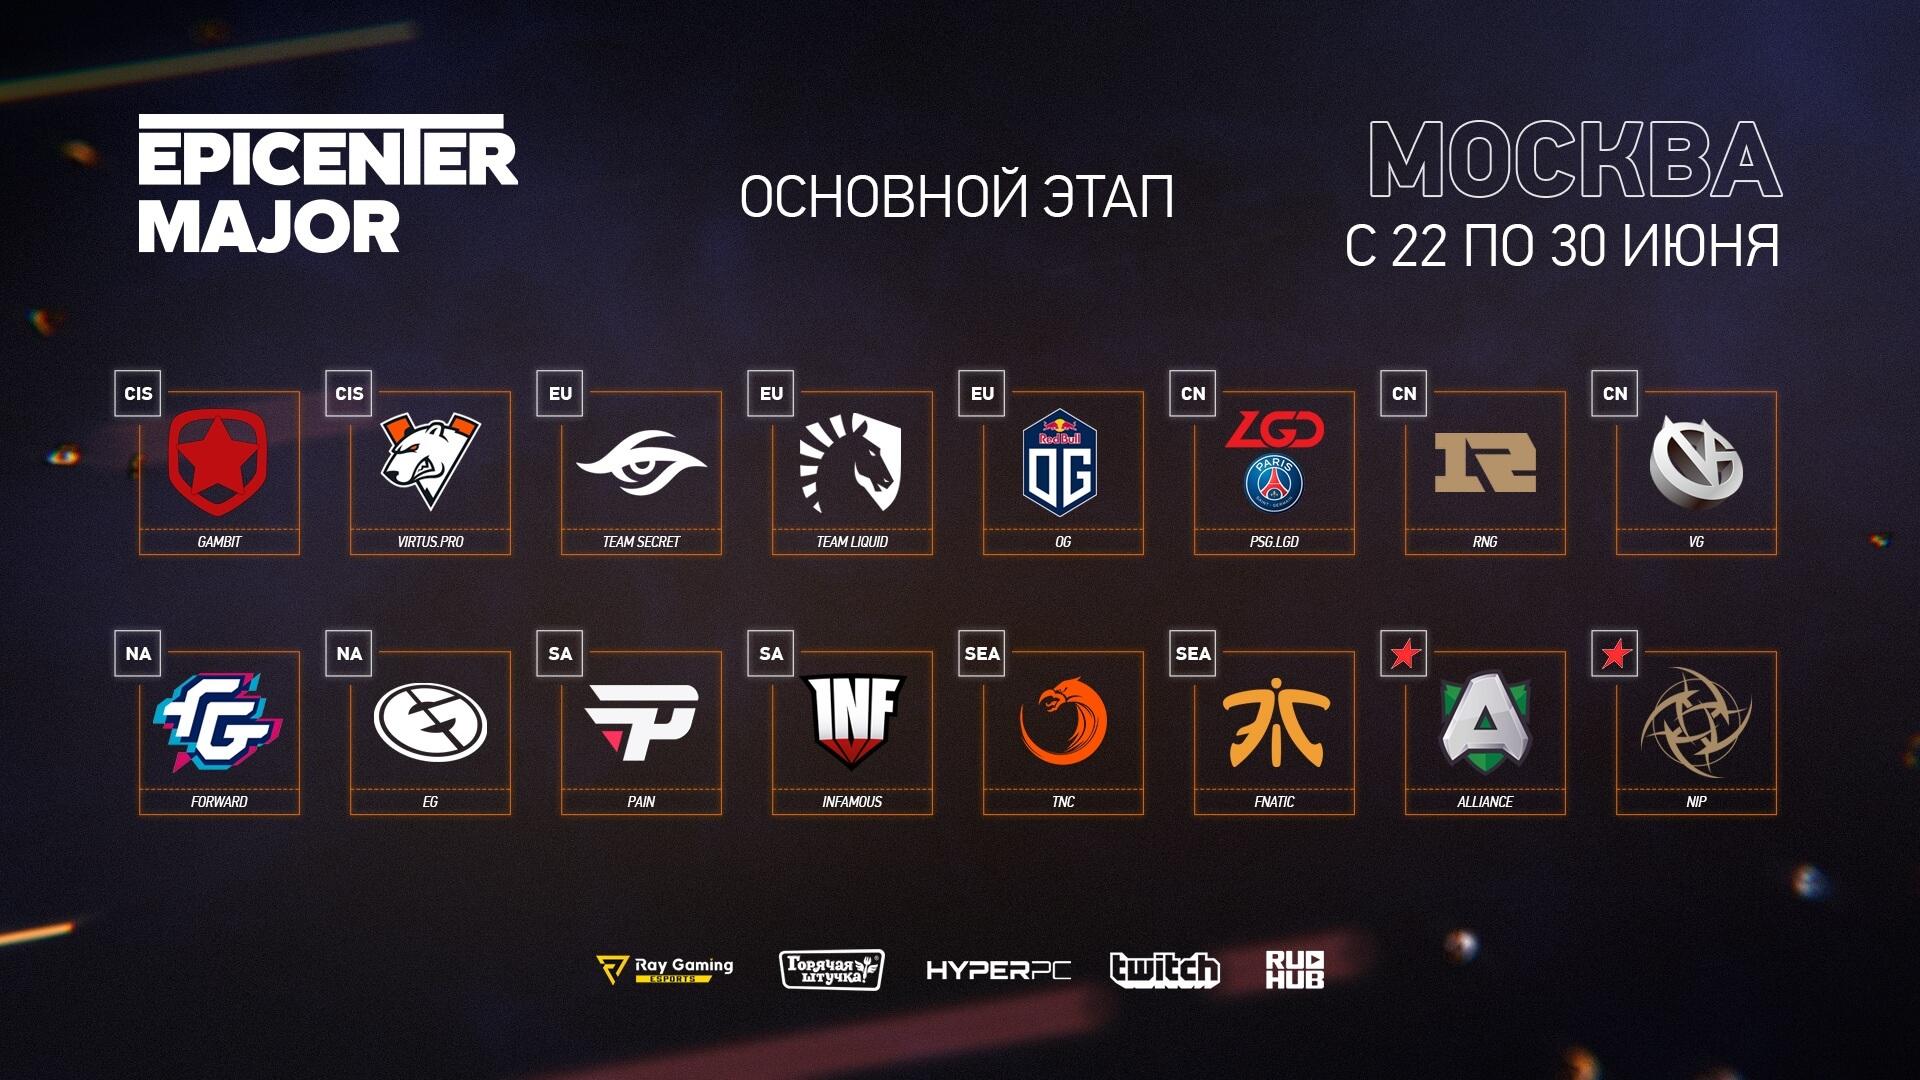 Epicenter 2019 команды участники